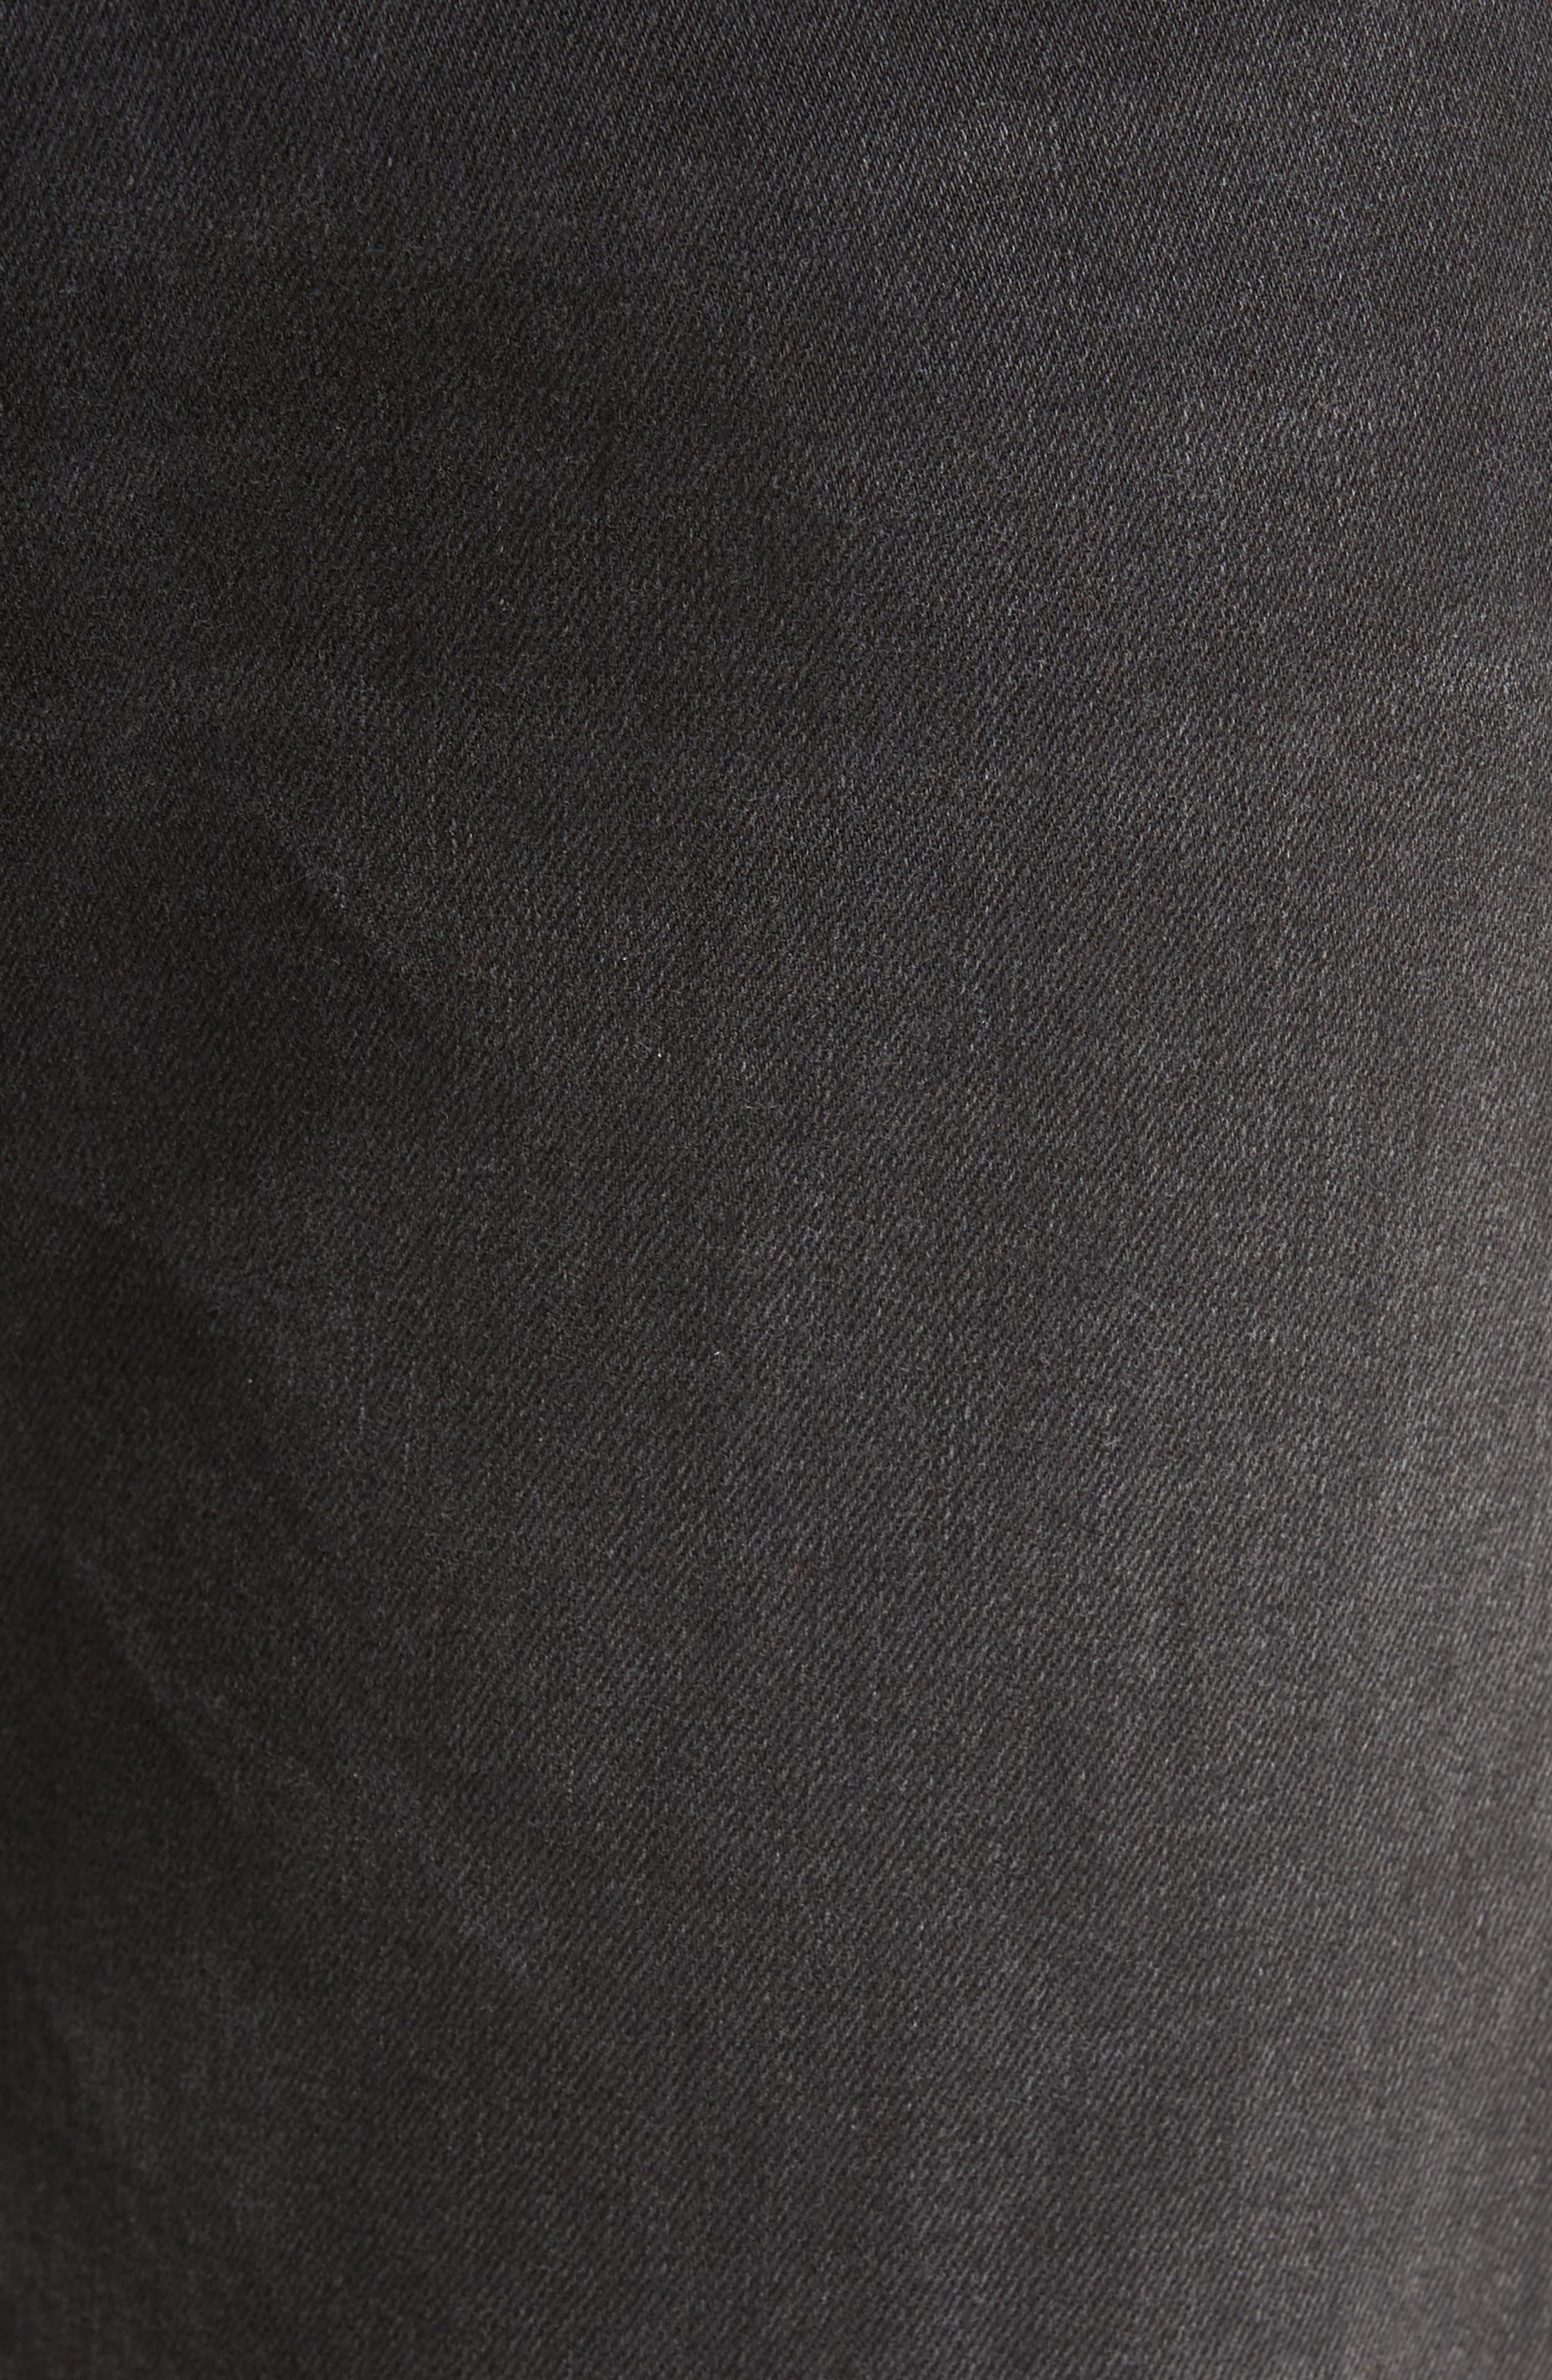 Matt Relaxed Fit Jeans,                             Alternate thumbnail 5, color,                             050